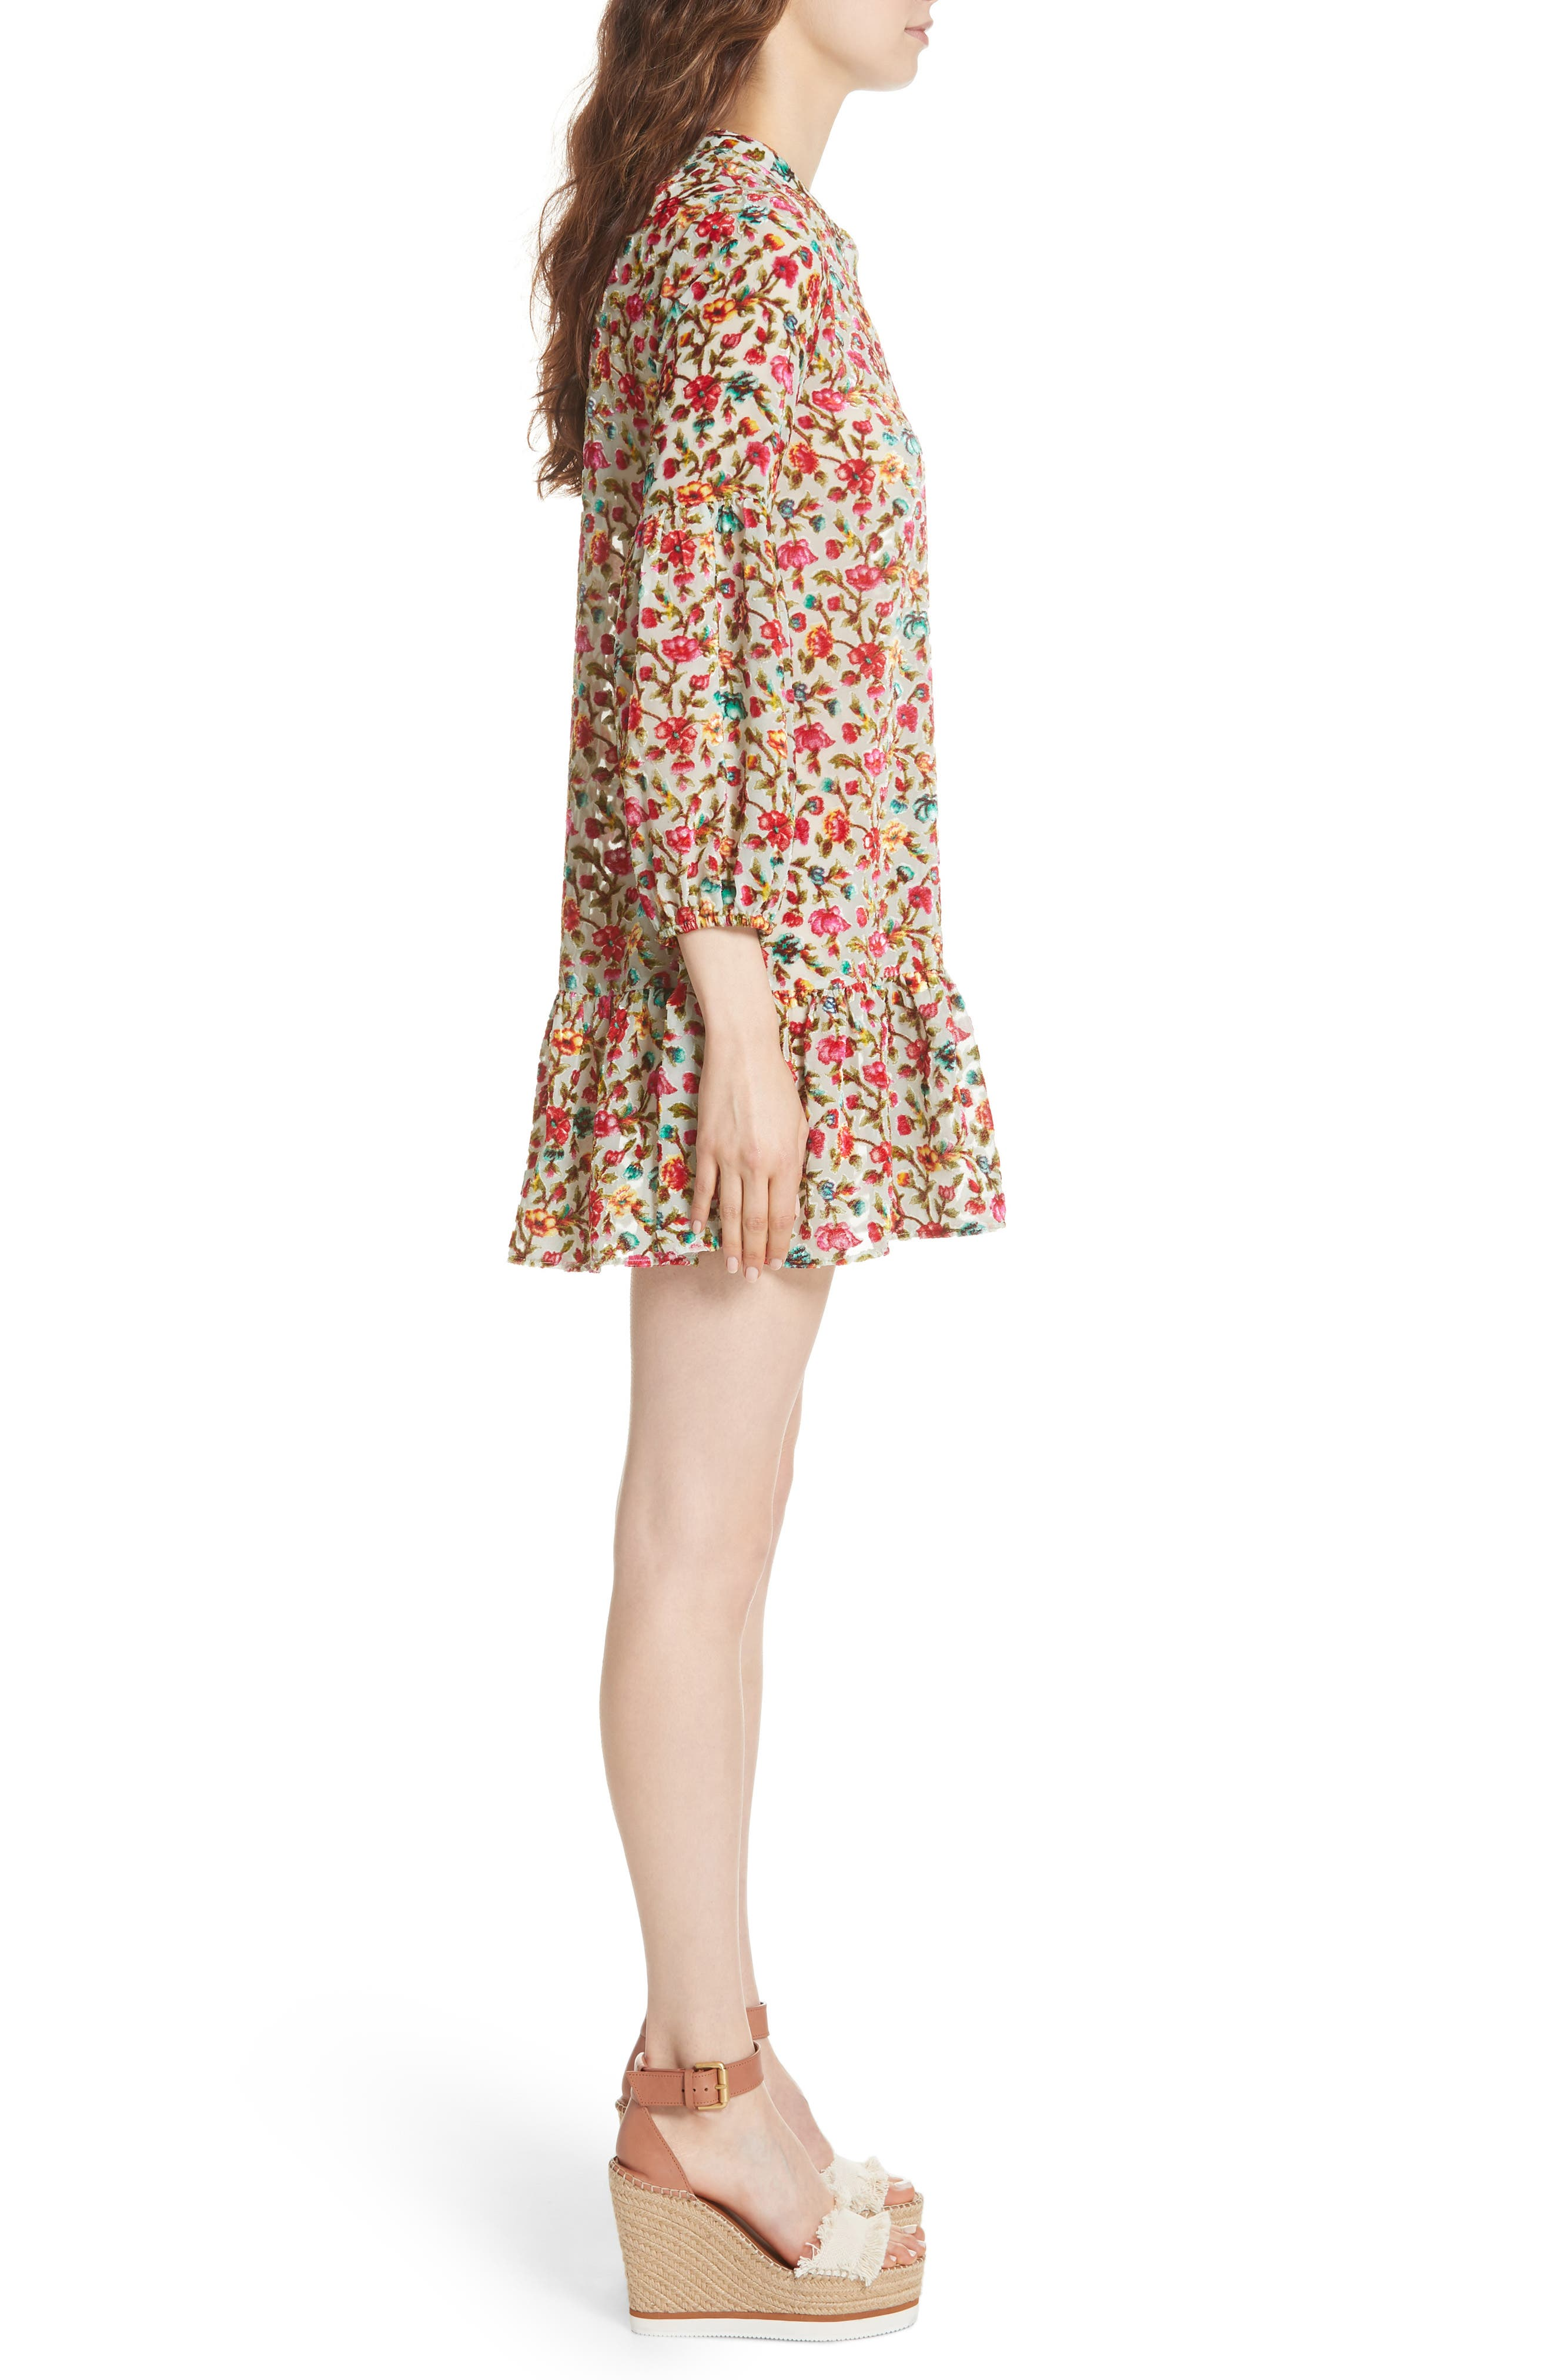 Simpson Printed Dress,                             Alternate thumbnail 3, color,                             693